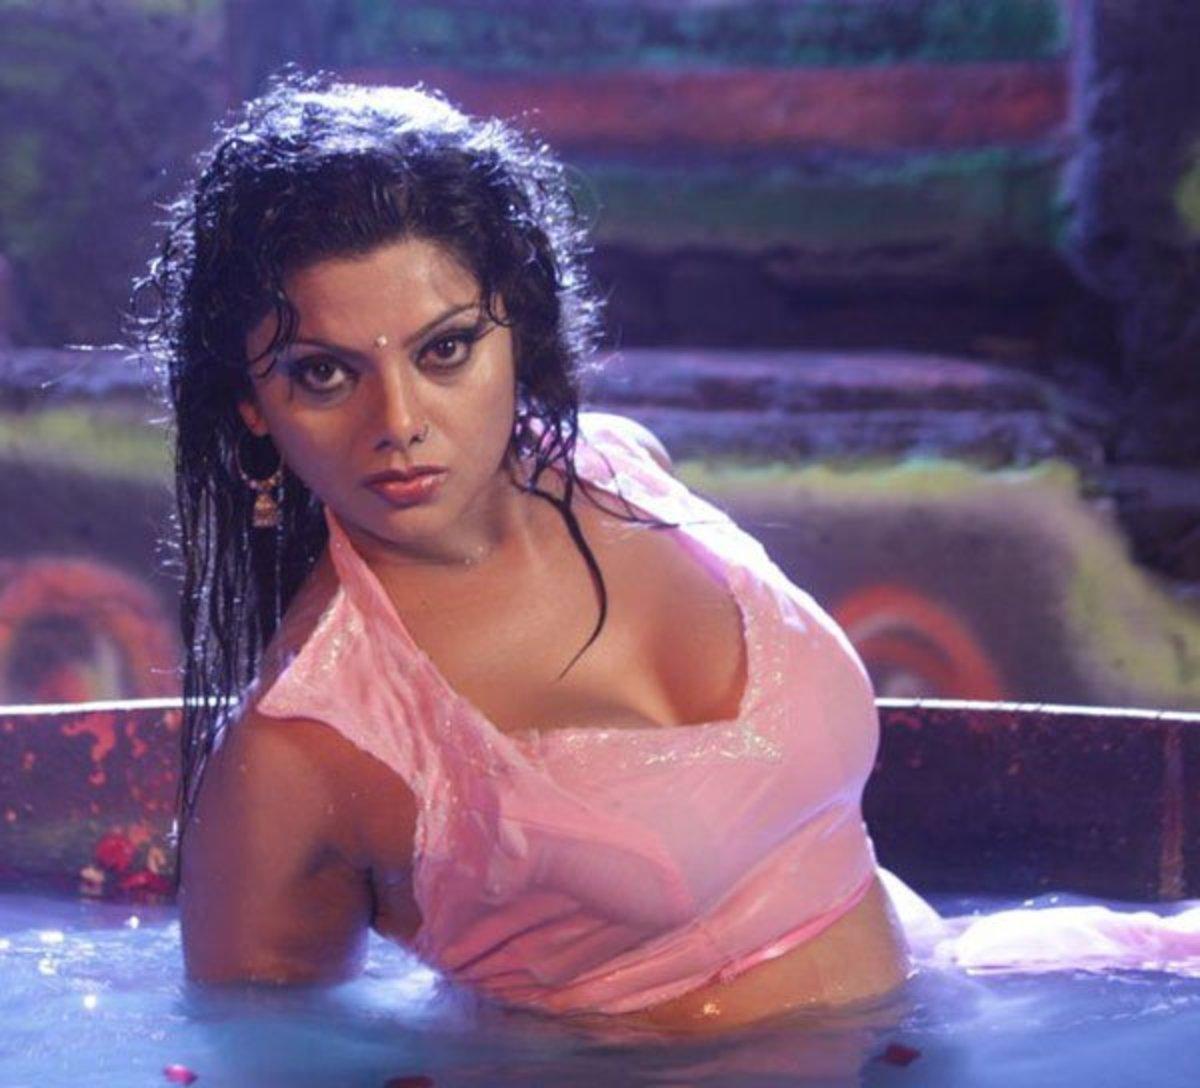 Swathi soaked in water